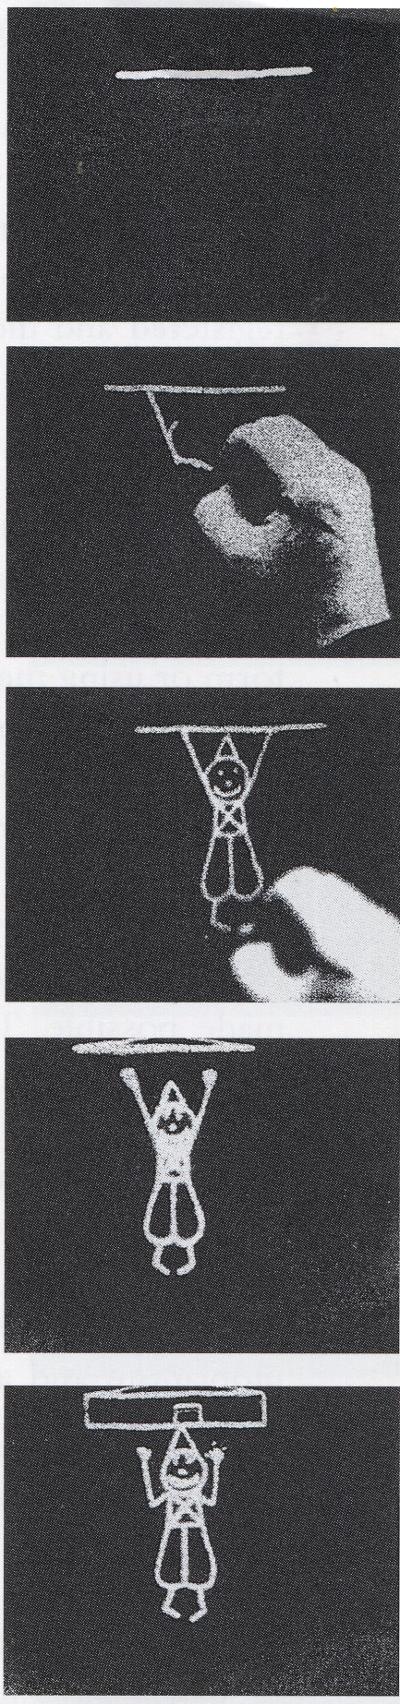 thesis on gesture